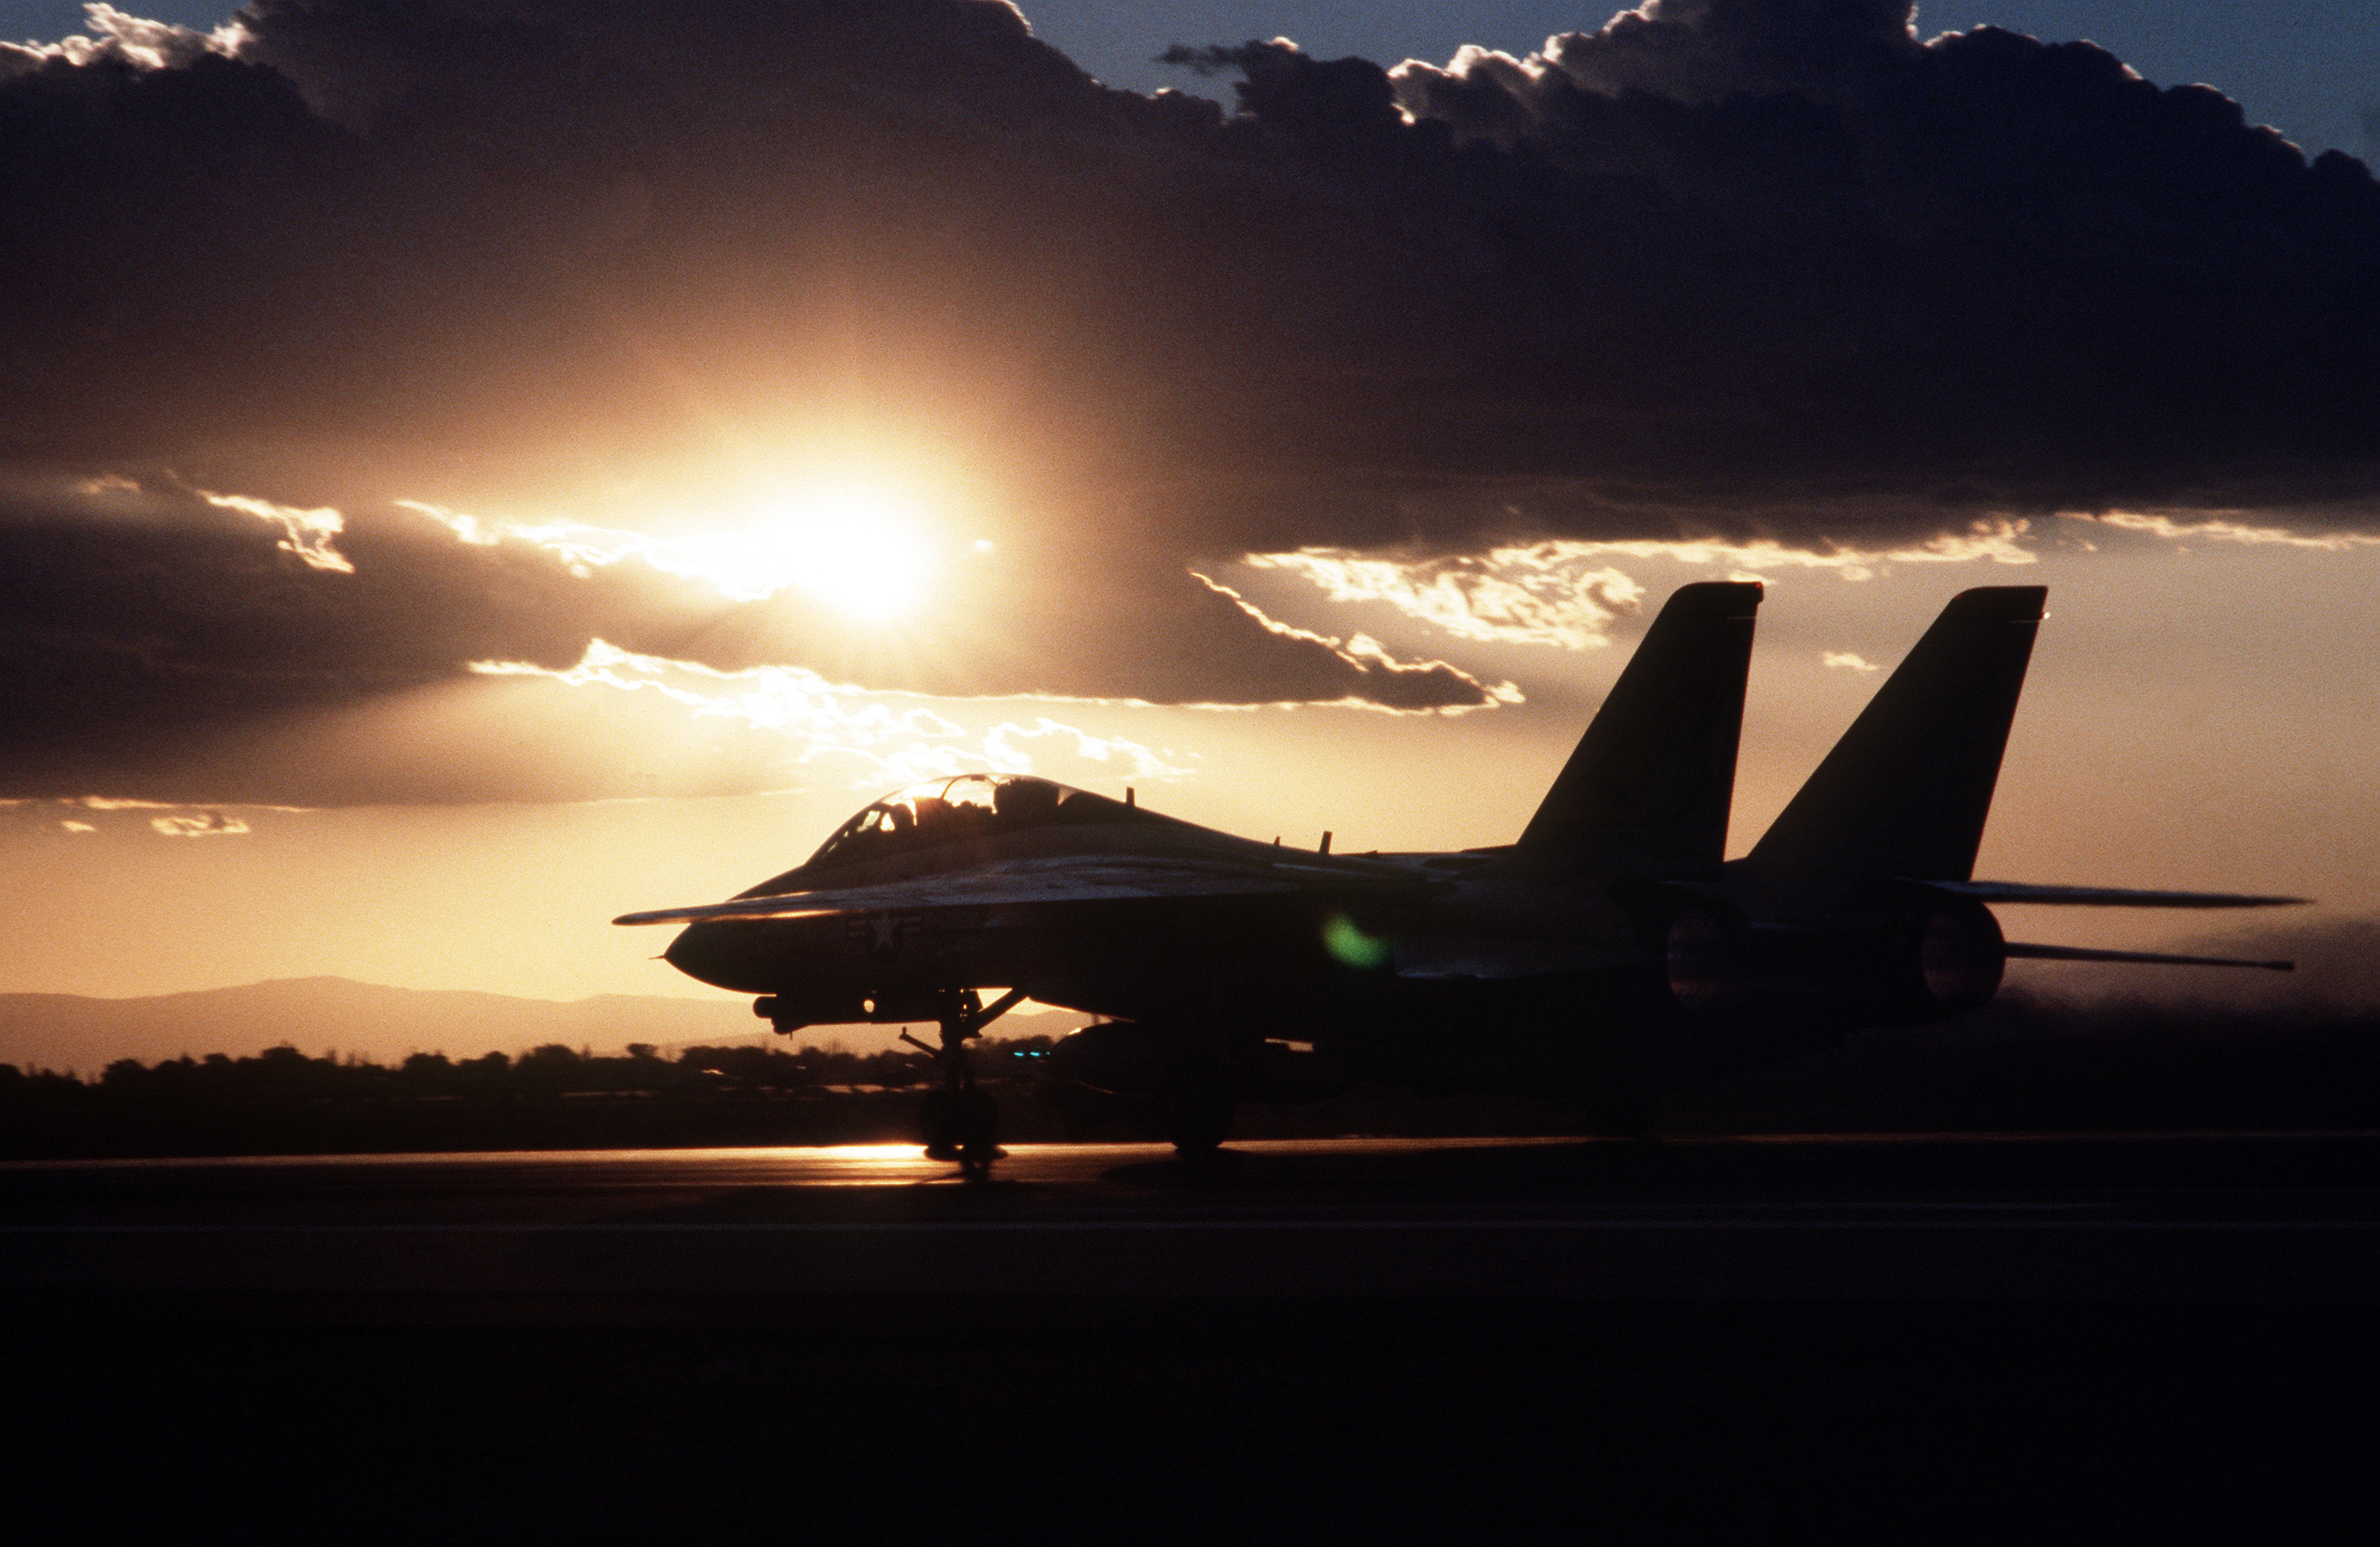 F 14 (戦闘機)の画像 p1_40